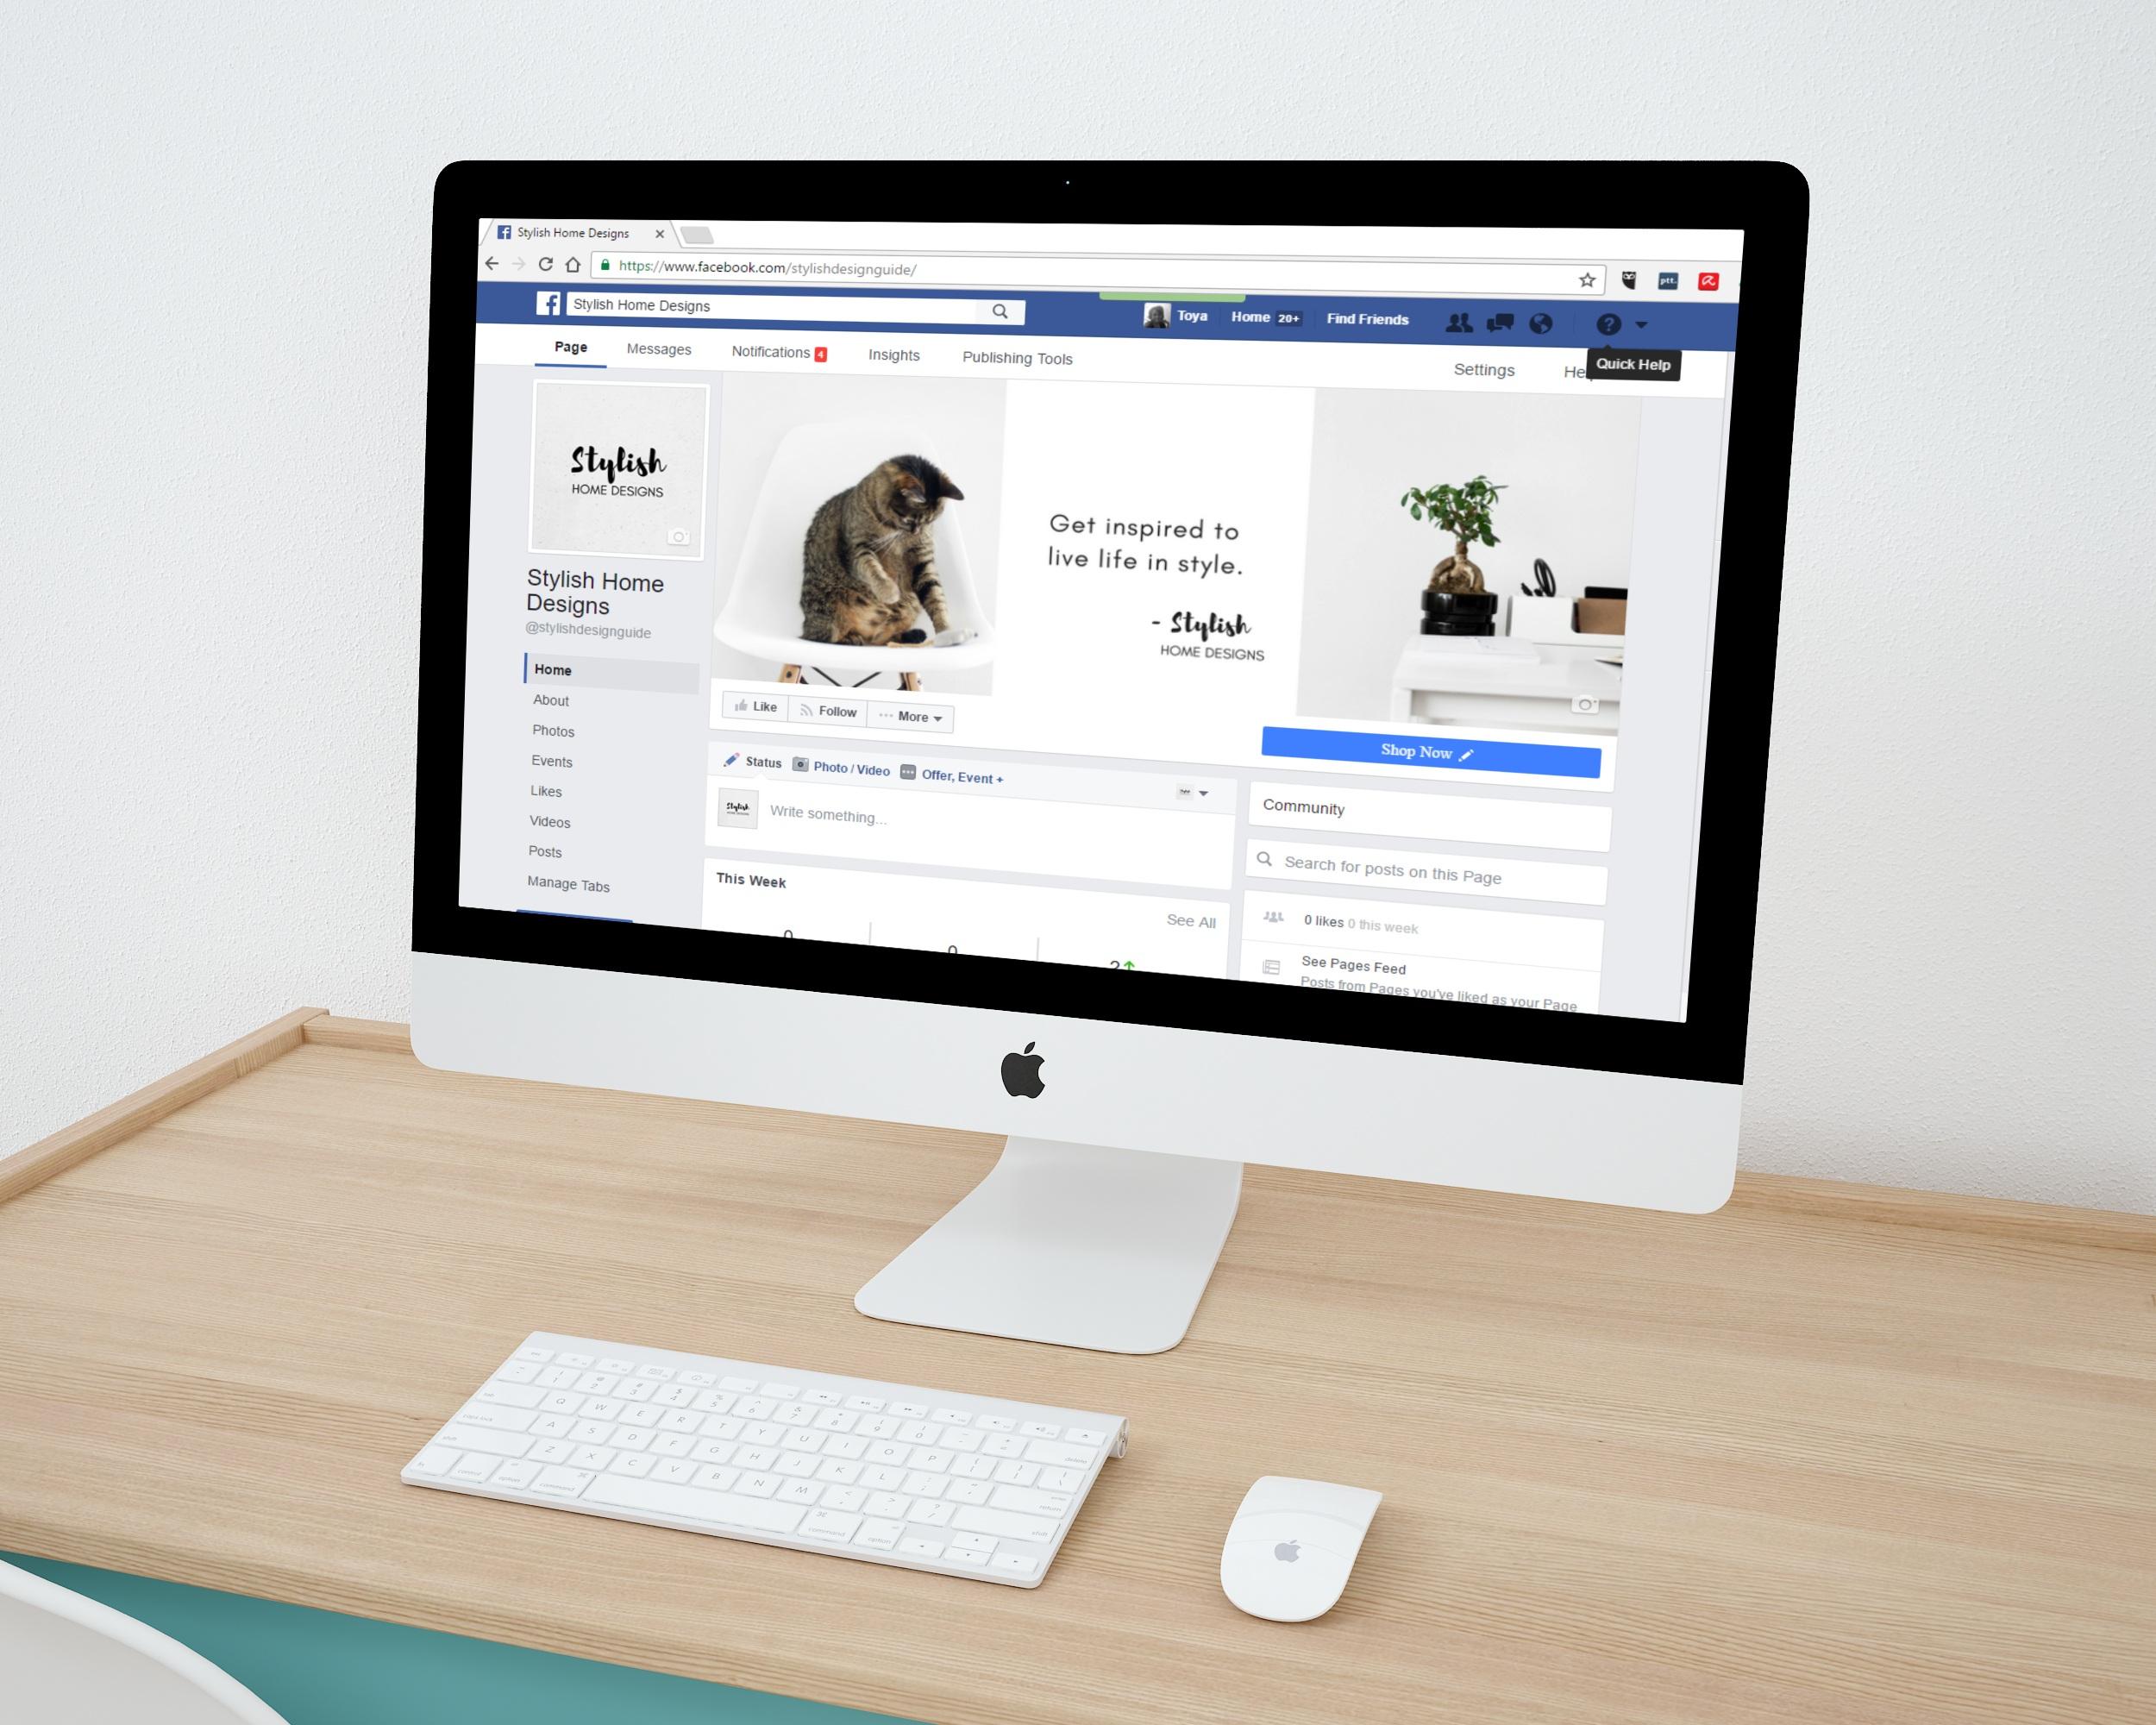 Free Images : community, desktop, communication, website, social ...